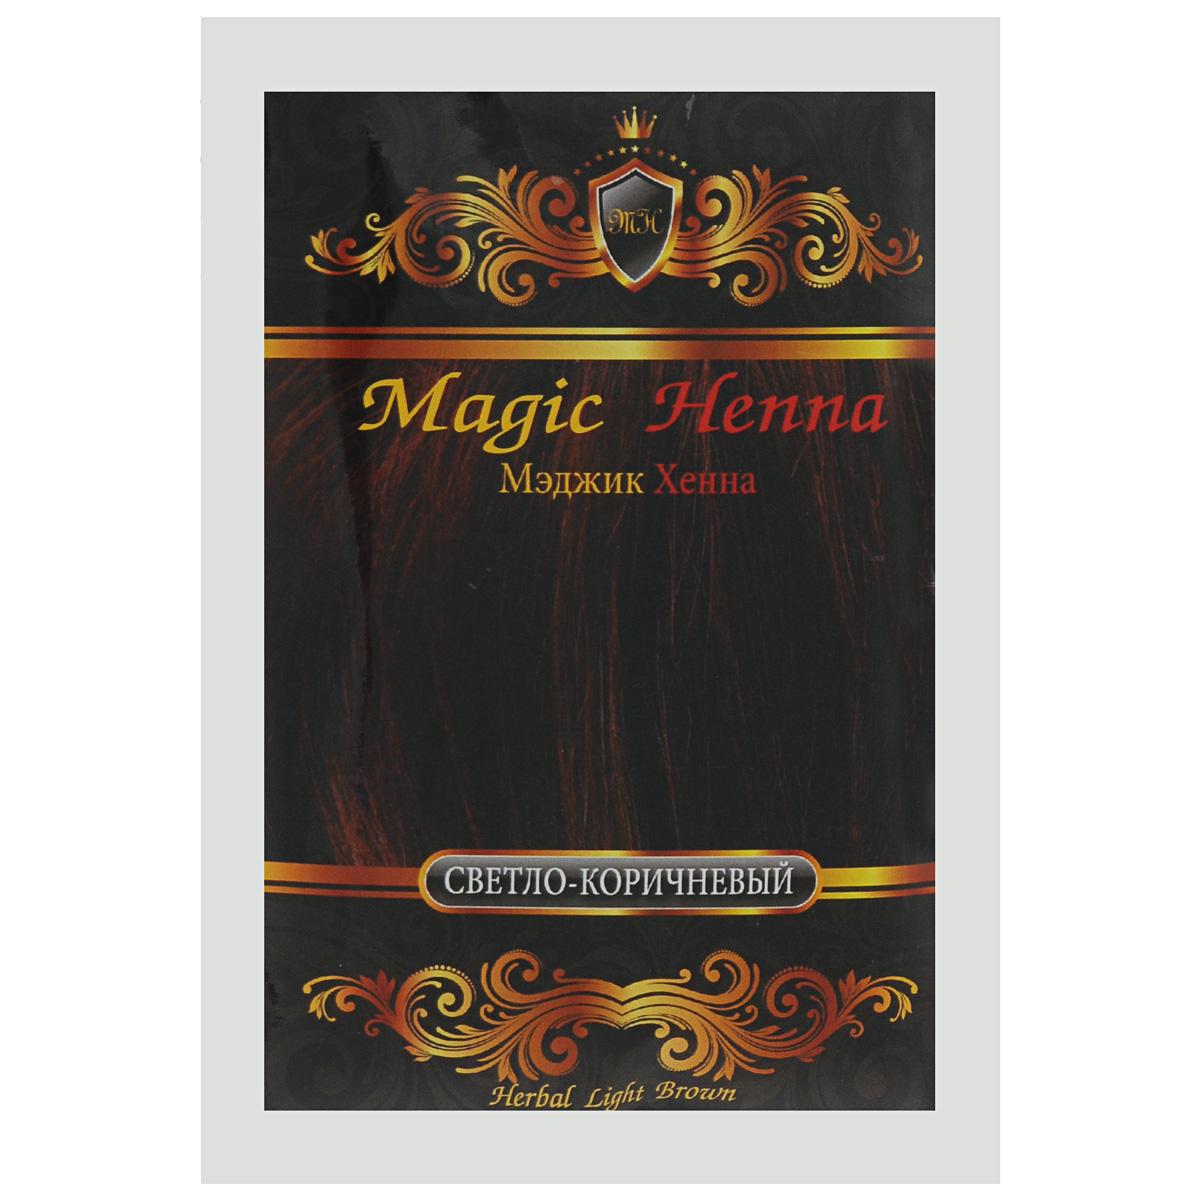 Magic Henna Лечебная травяная краска для волос с хной, светло-коричневый (Light Brown), 100 г7146Лечебная травяная краска с хной Magic Henna - Темно-коричневый (Dark Brown)